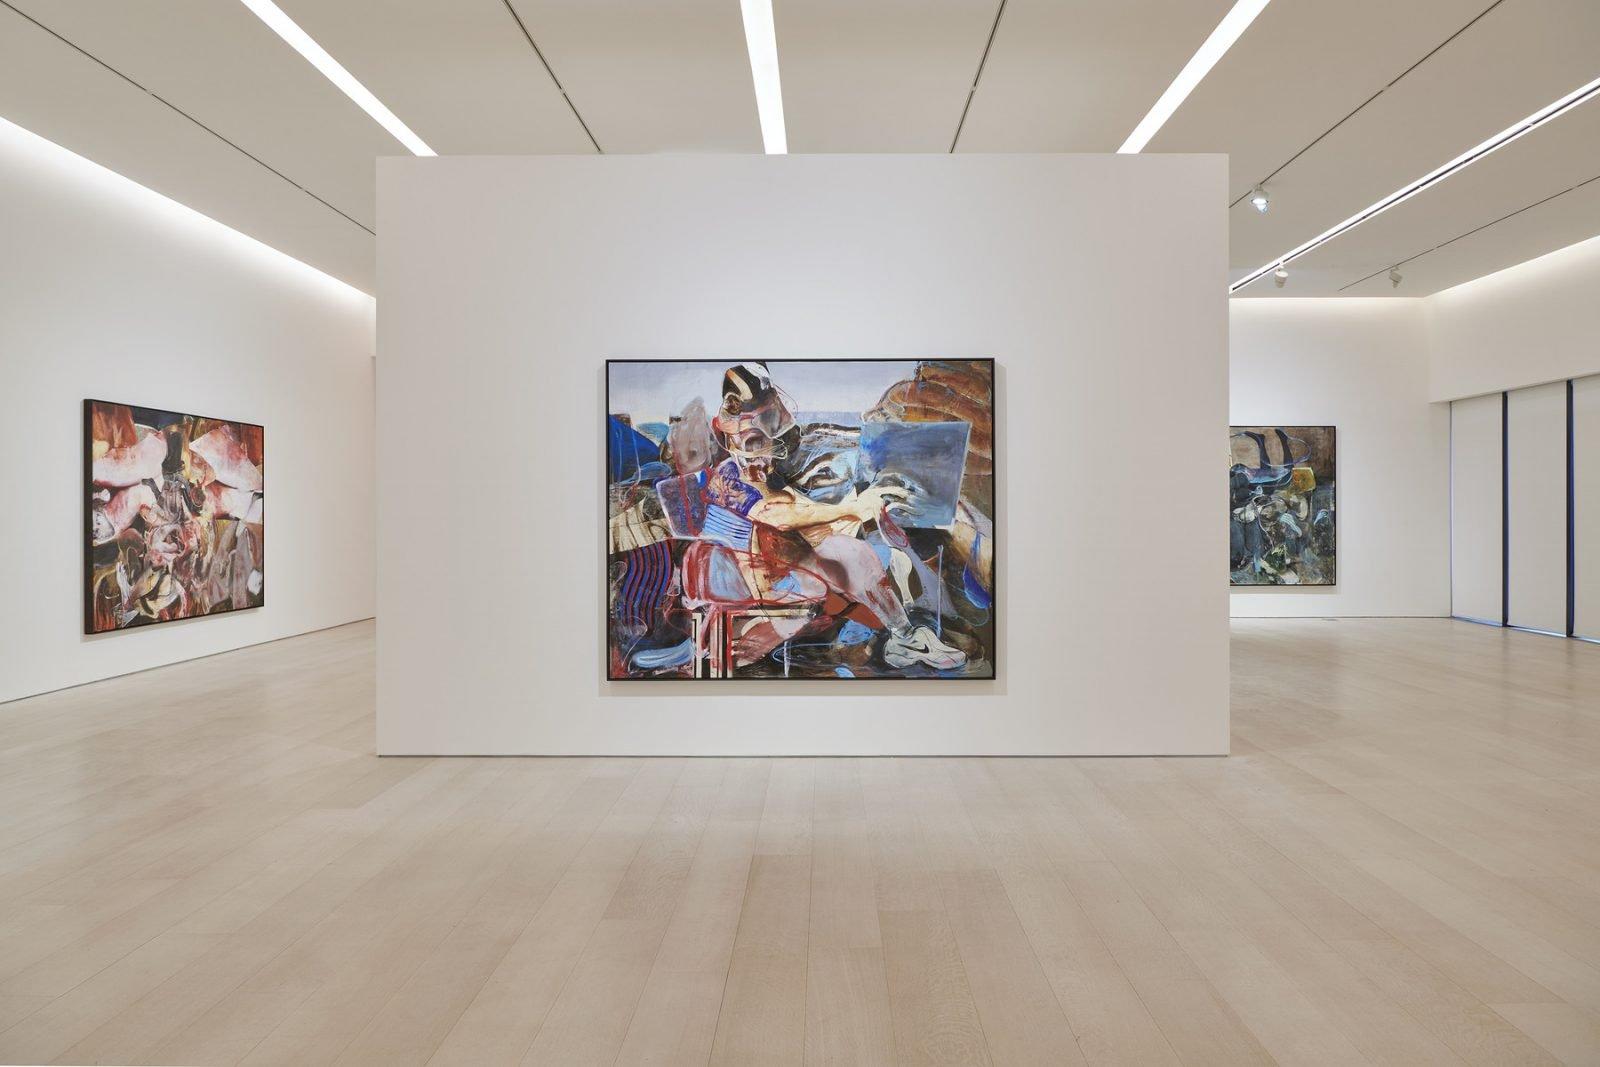 Installation view, Adrian Ghenie: The Hooligans, Pace Gallery, 540 West 25th Street, New York, November 20, 2020 – January 16, 2021 © Adrian Ghenie, courtesy Pace Gallery.